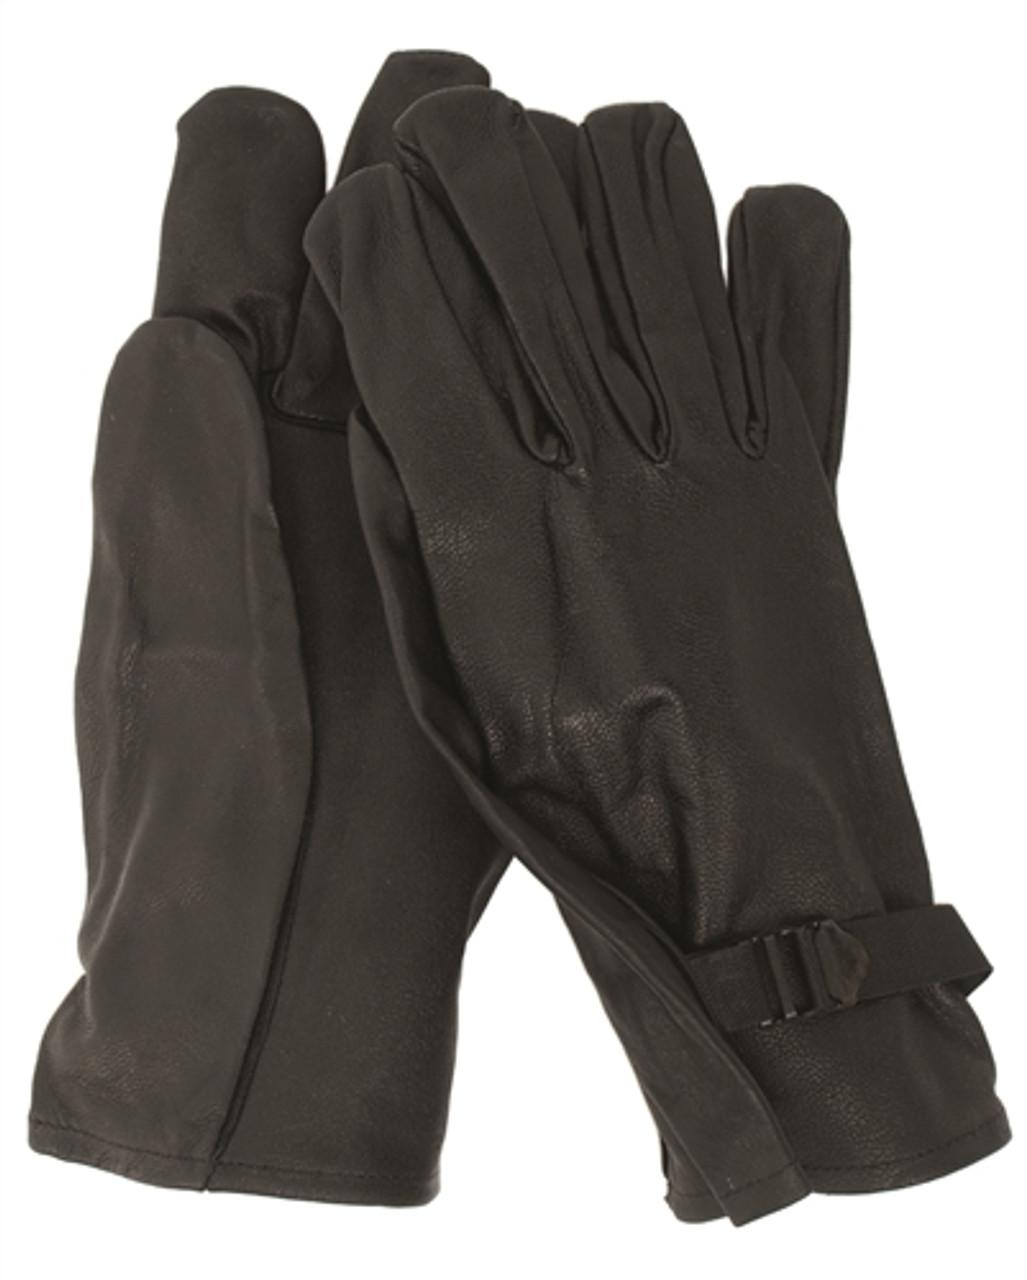 Belgium Black Leather Gloves from Hessen Antique